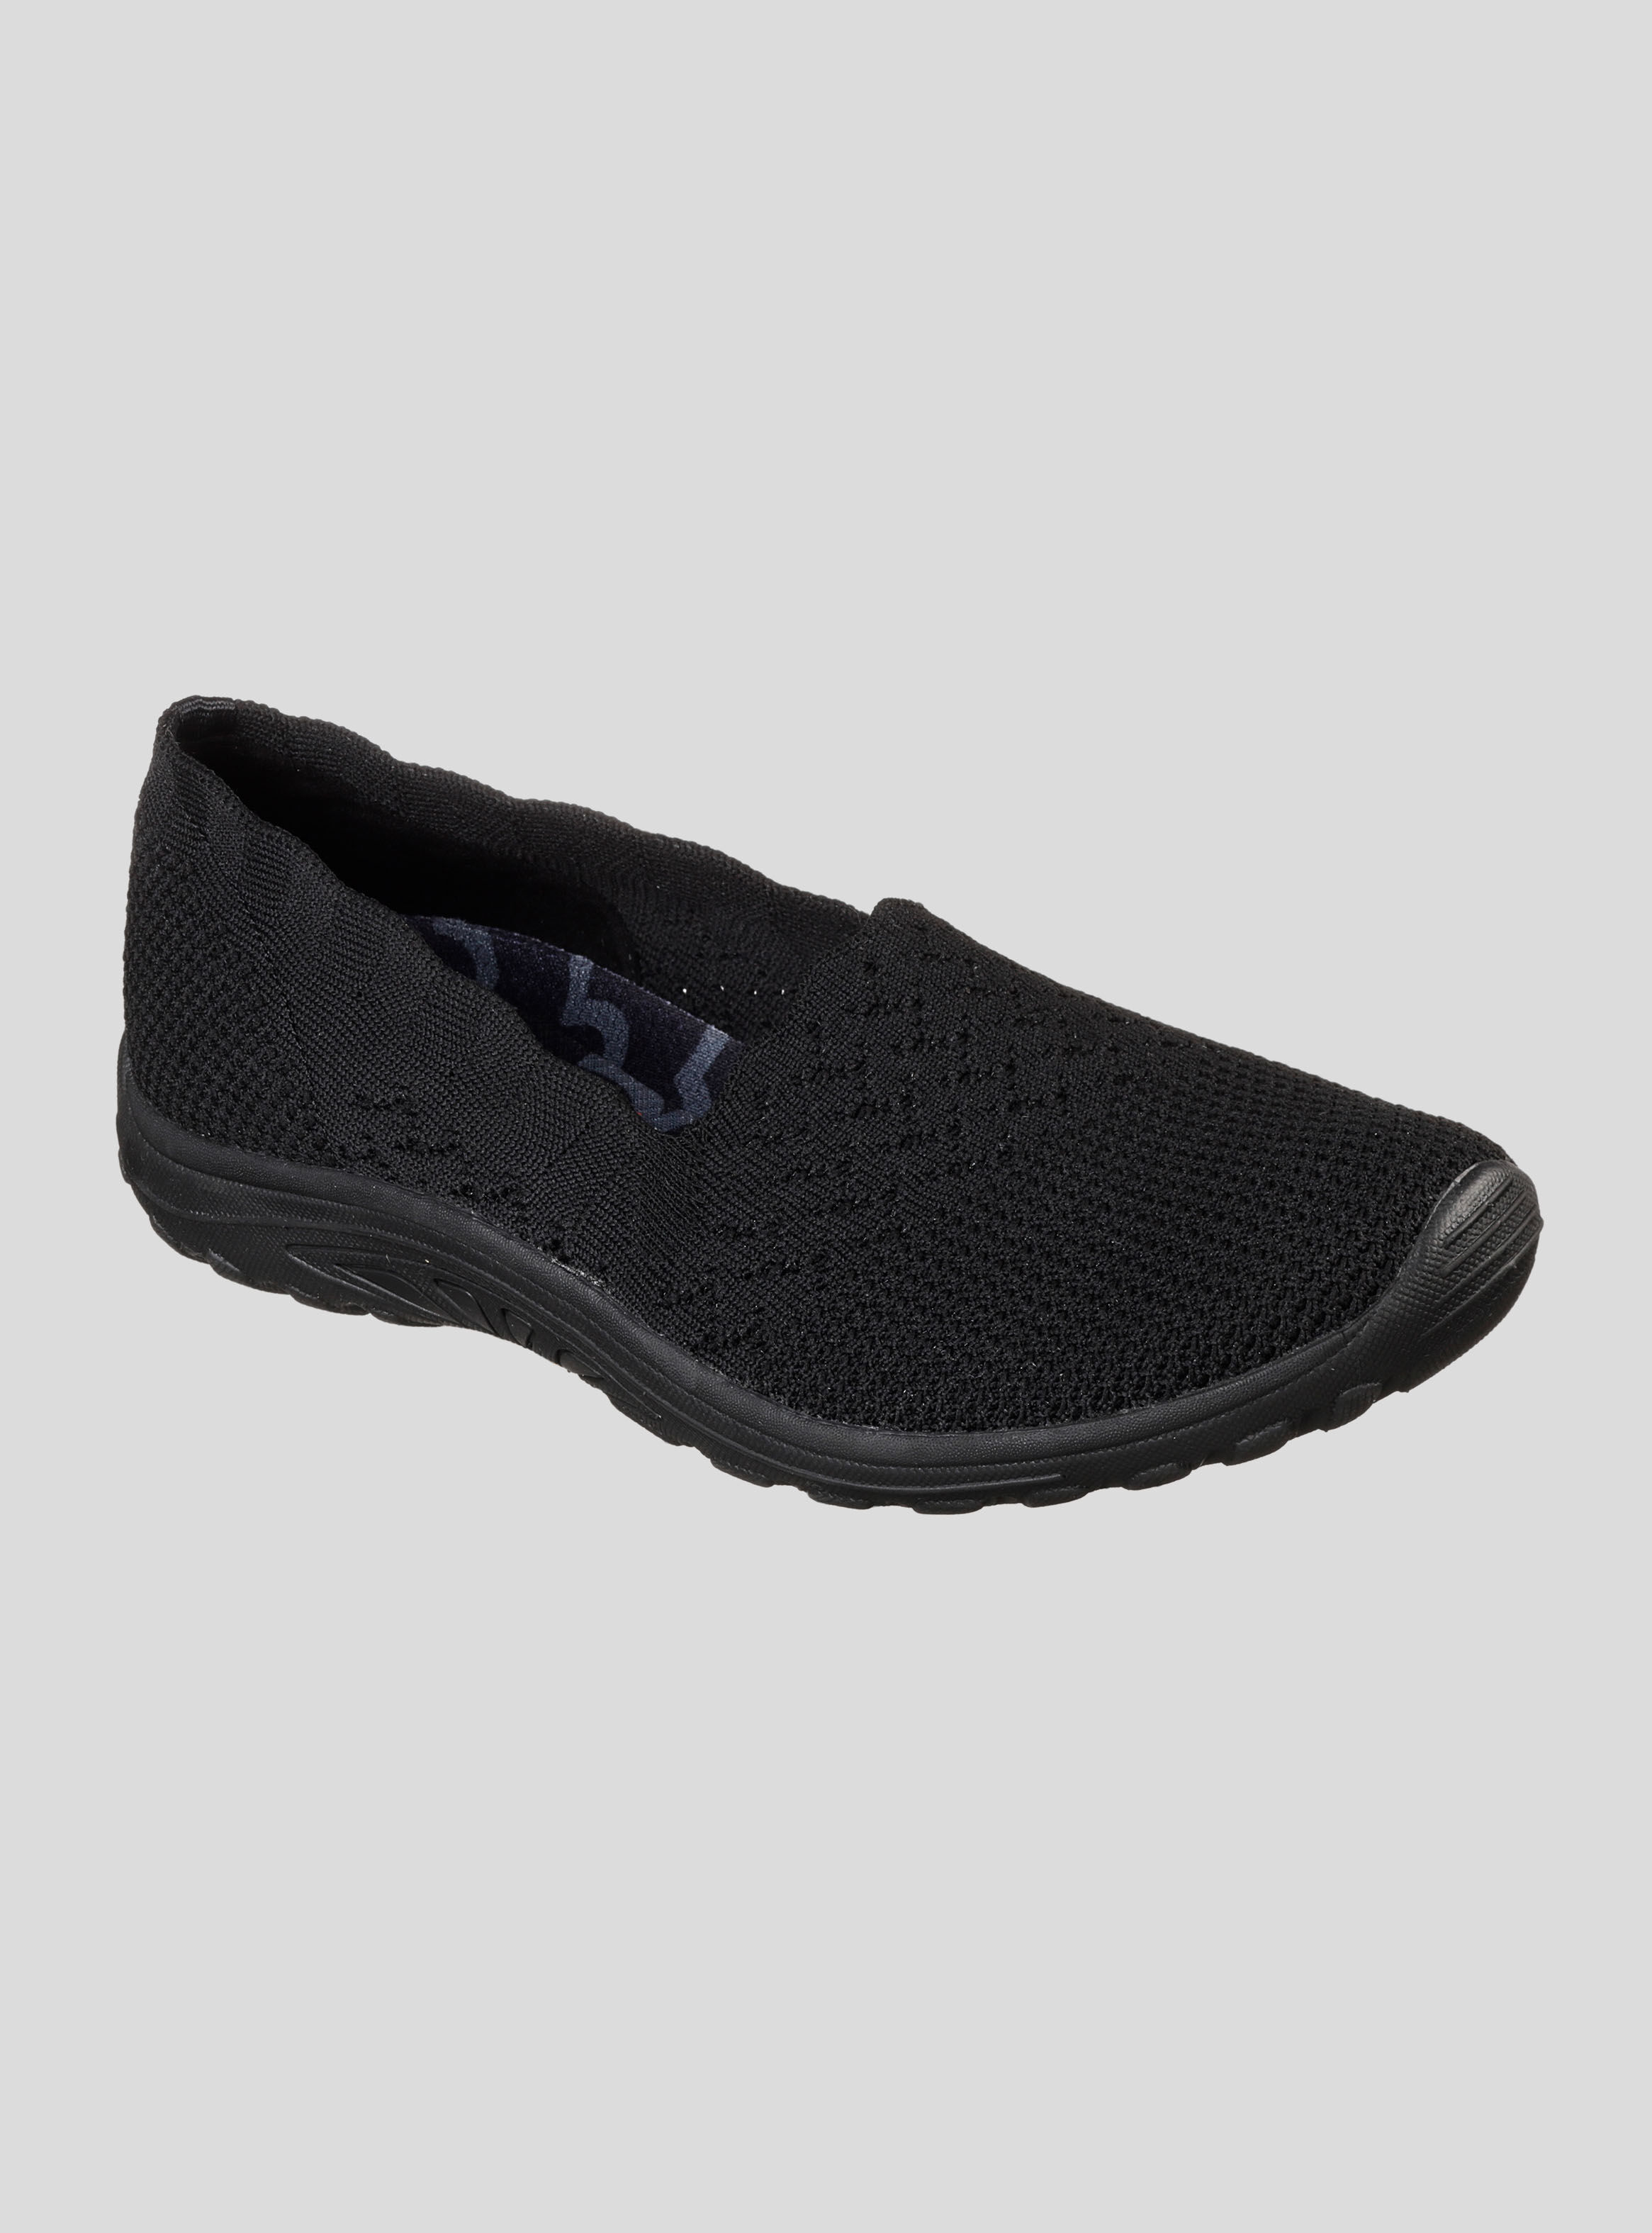 zapatos skechers mujer usa precios